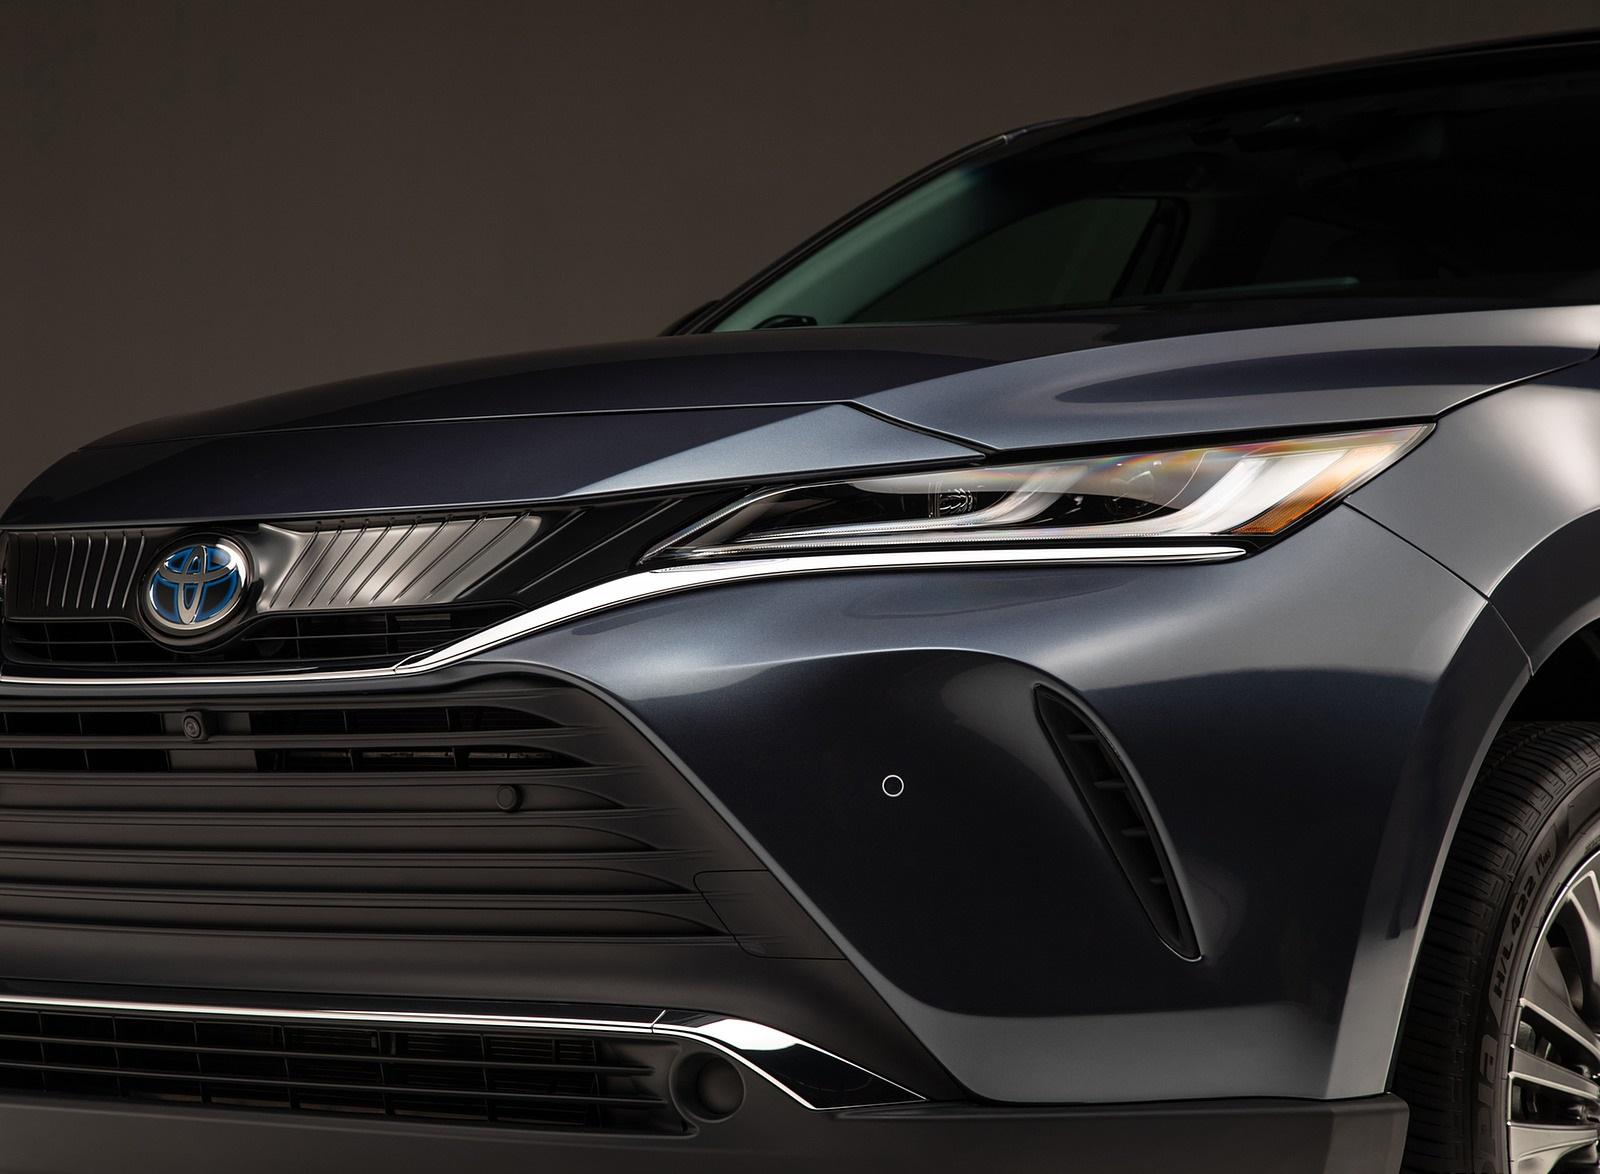 2021 Toyota Venza Headlight Wallpapers (8)